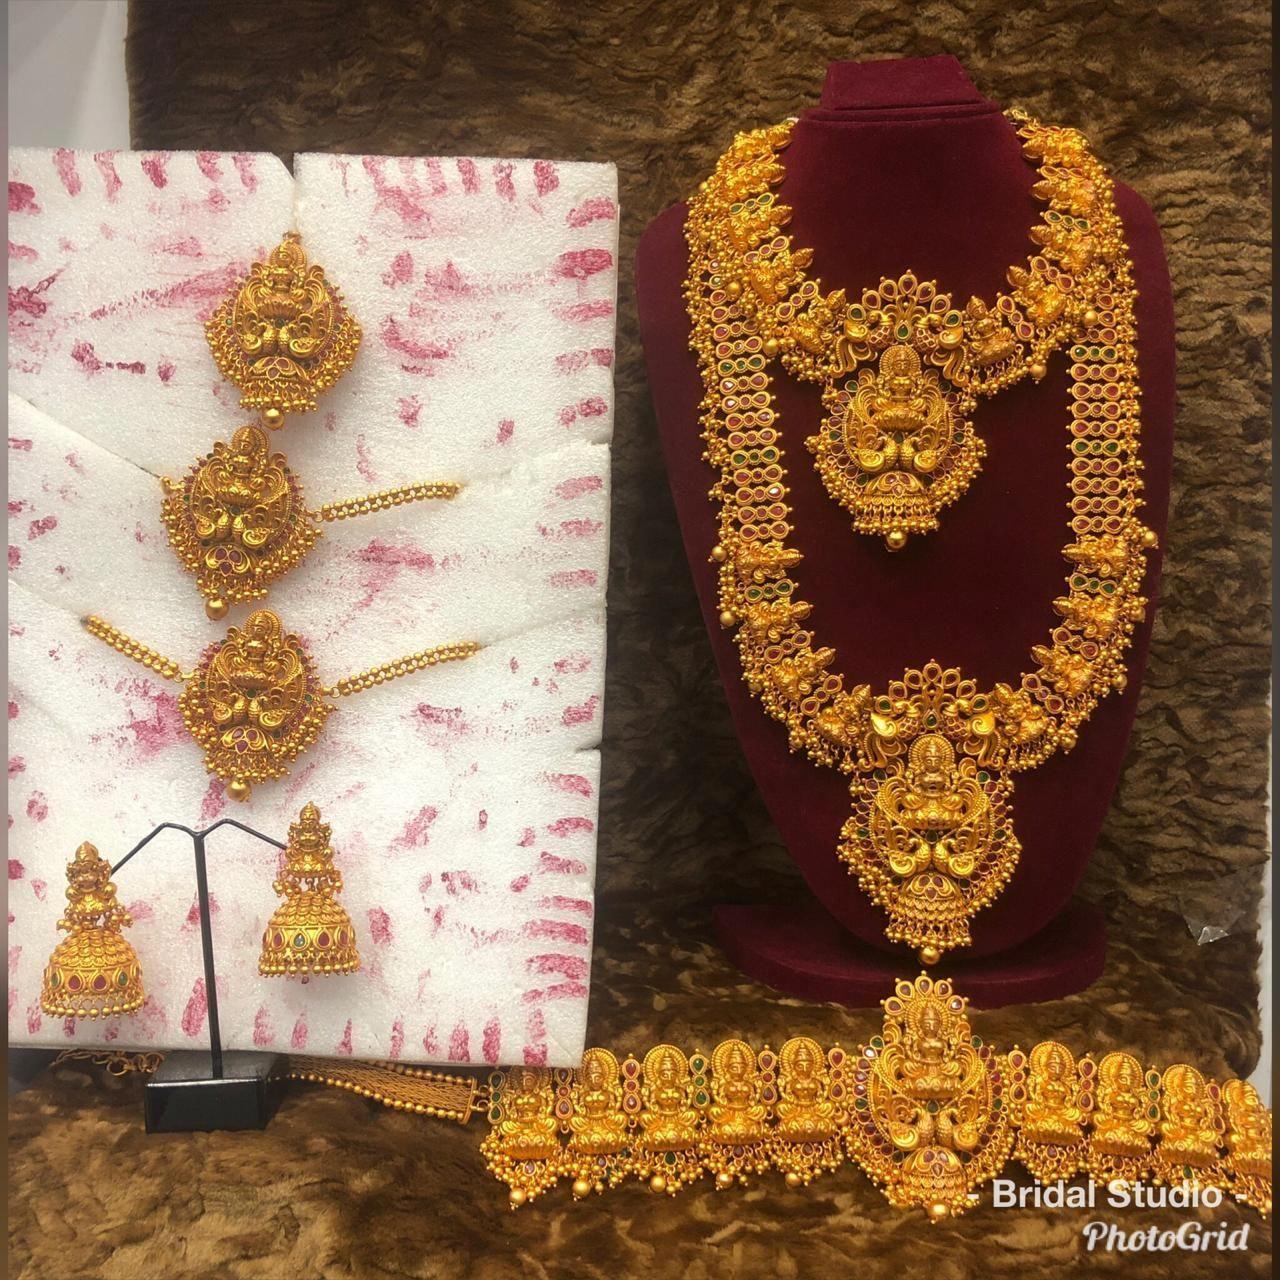 Rent Jewelleries In 2020 Jewel Wedding South Indian Bridal Jewellery Indian Wedding Jewelry